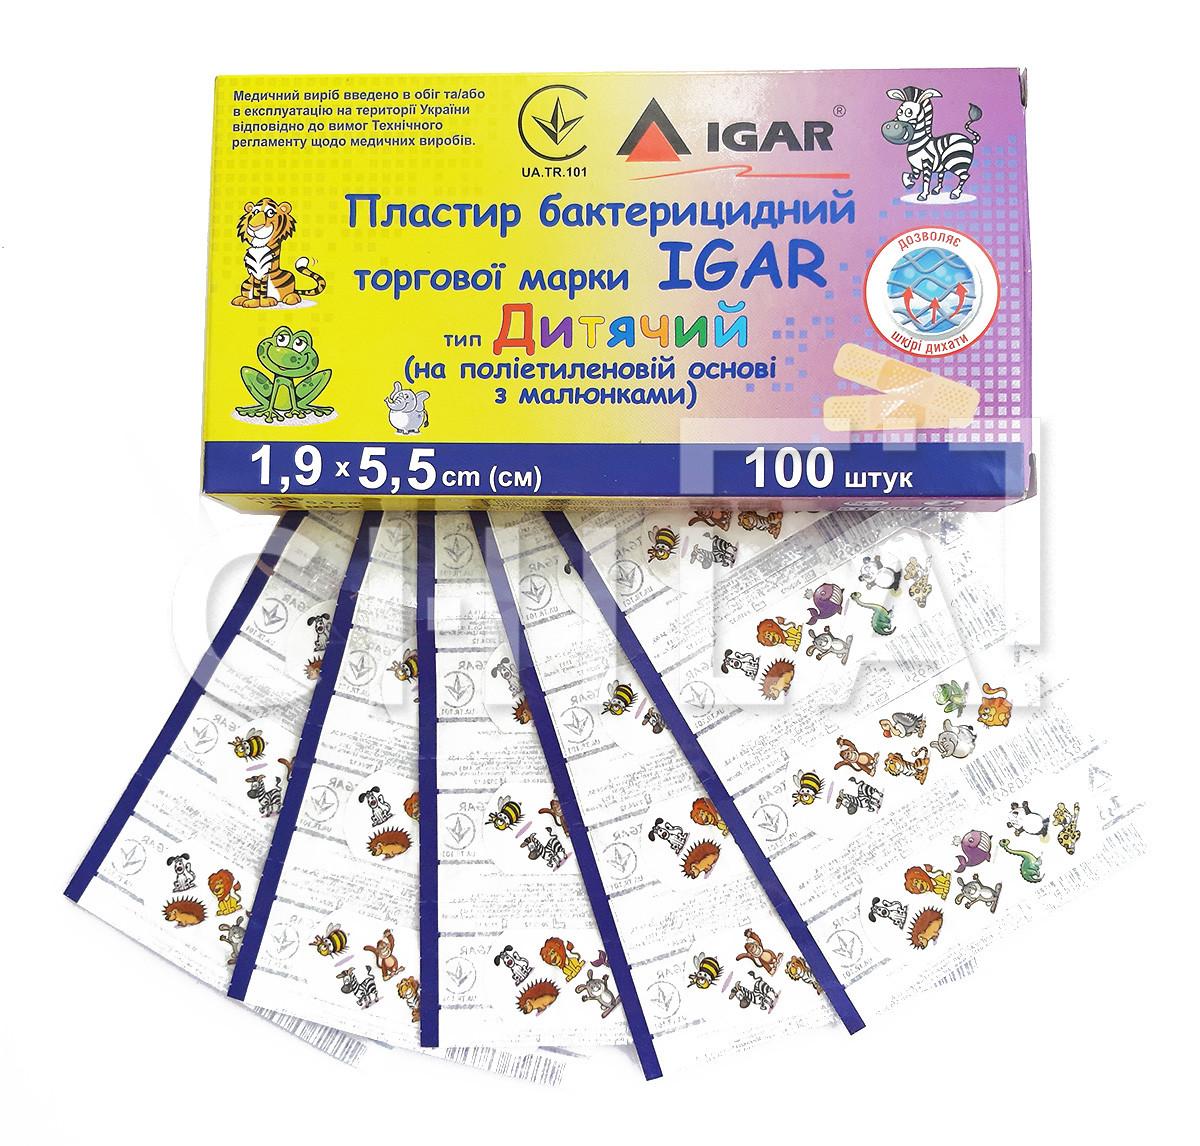 Пластырь бактерицидный IGAR Детский 1,9 х 5,5 см (100 шт/уп)